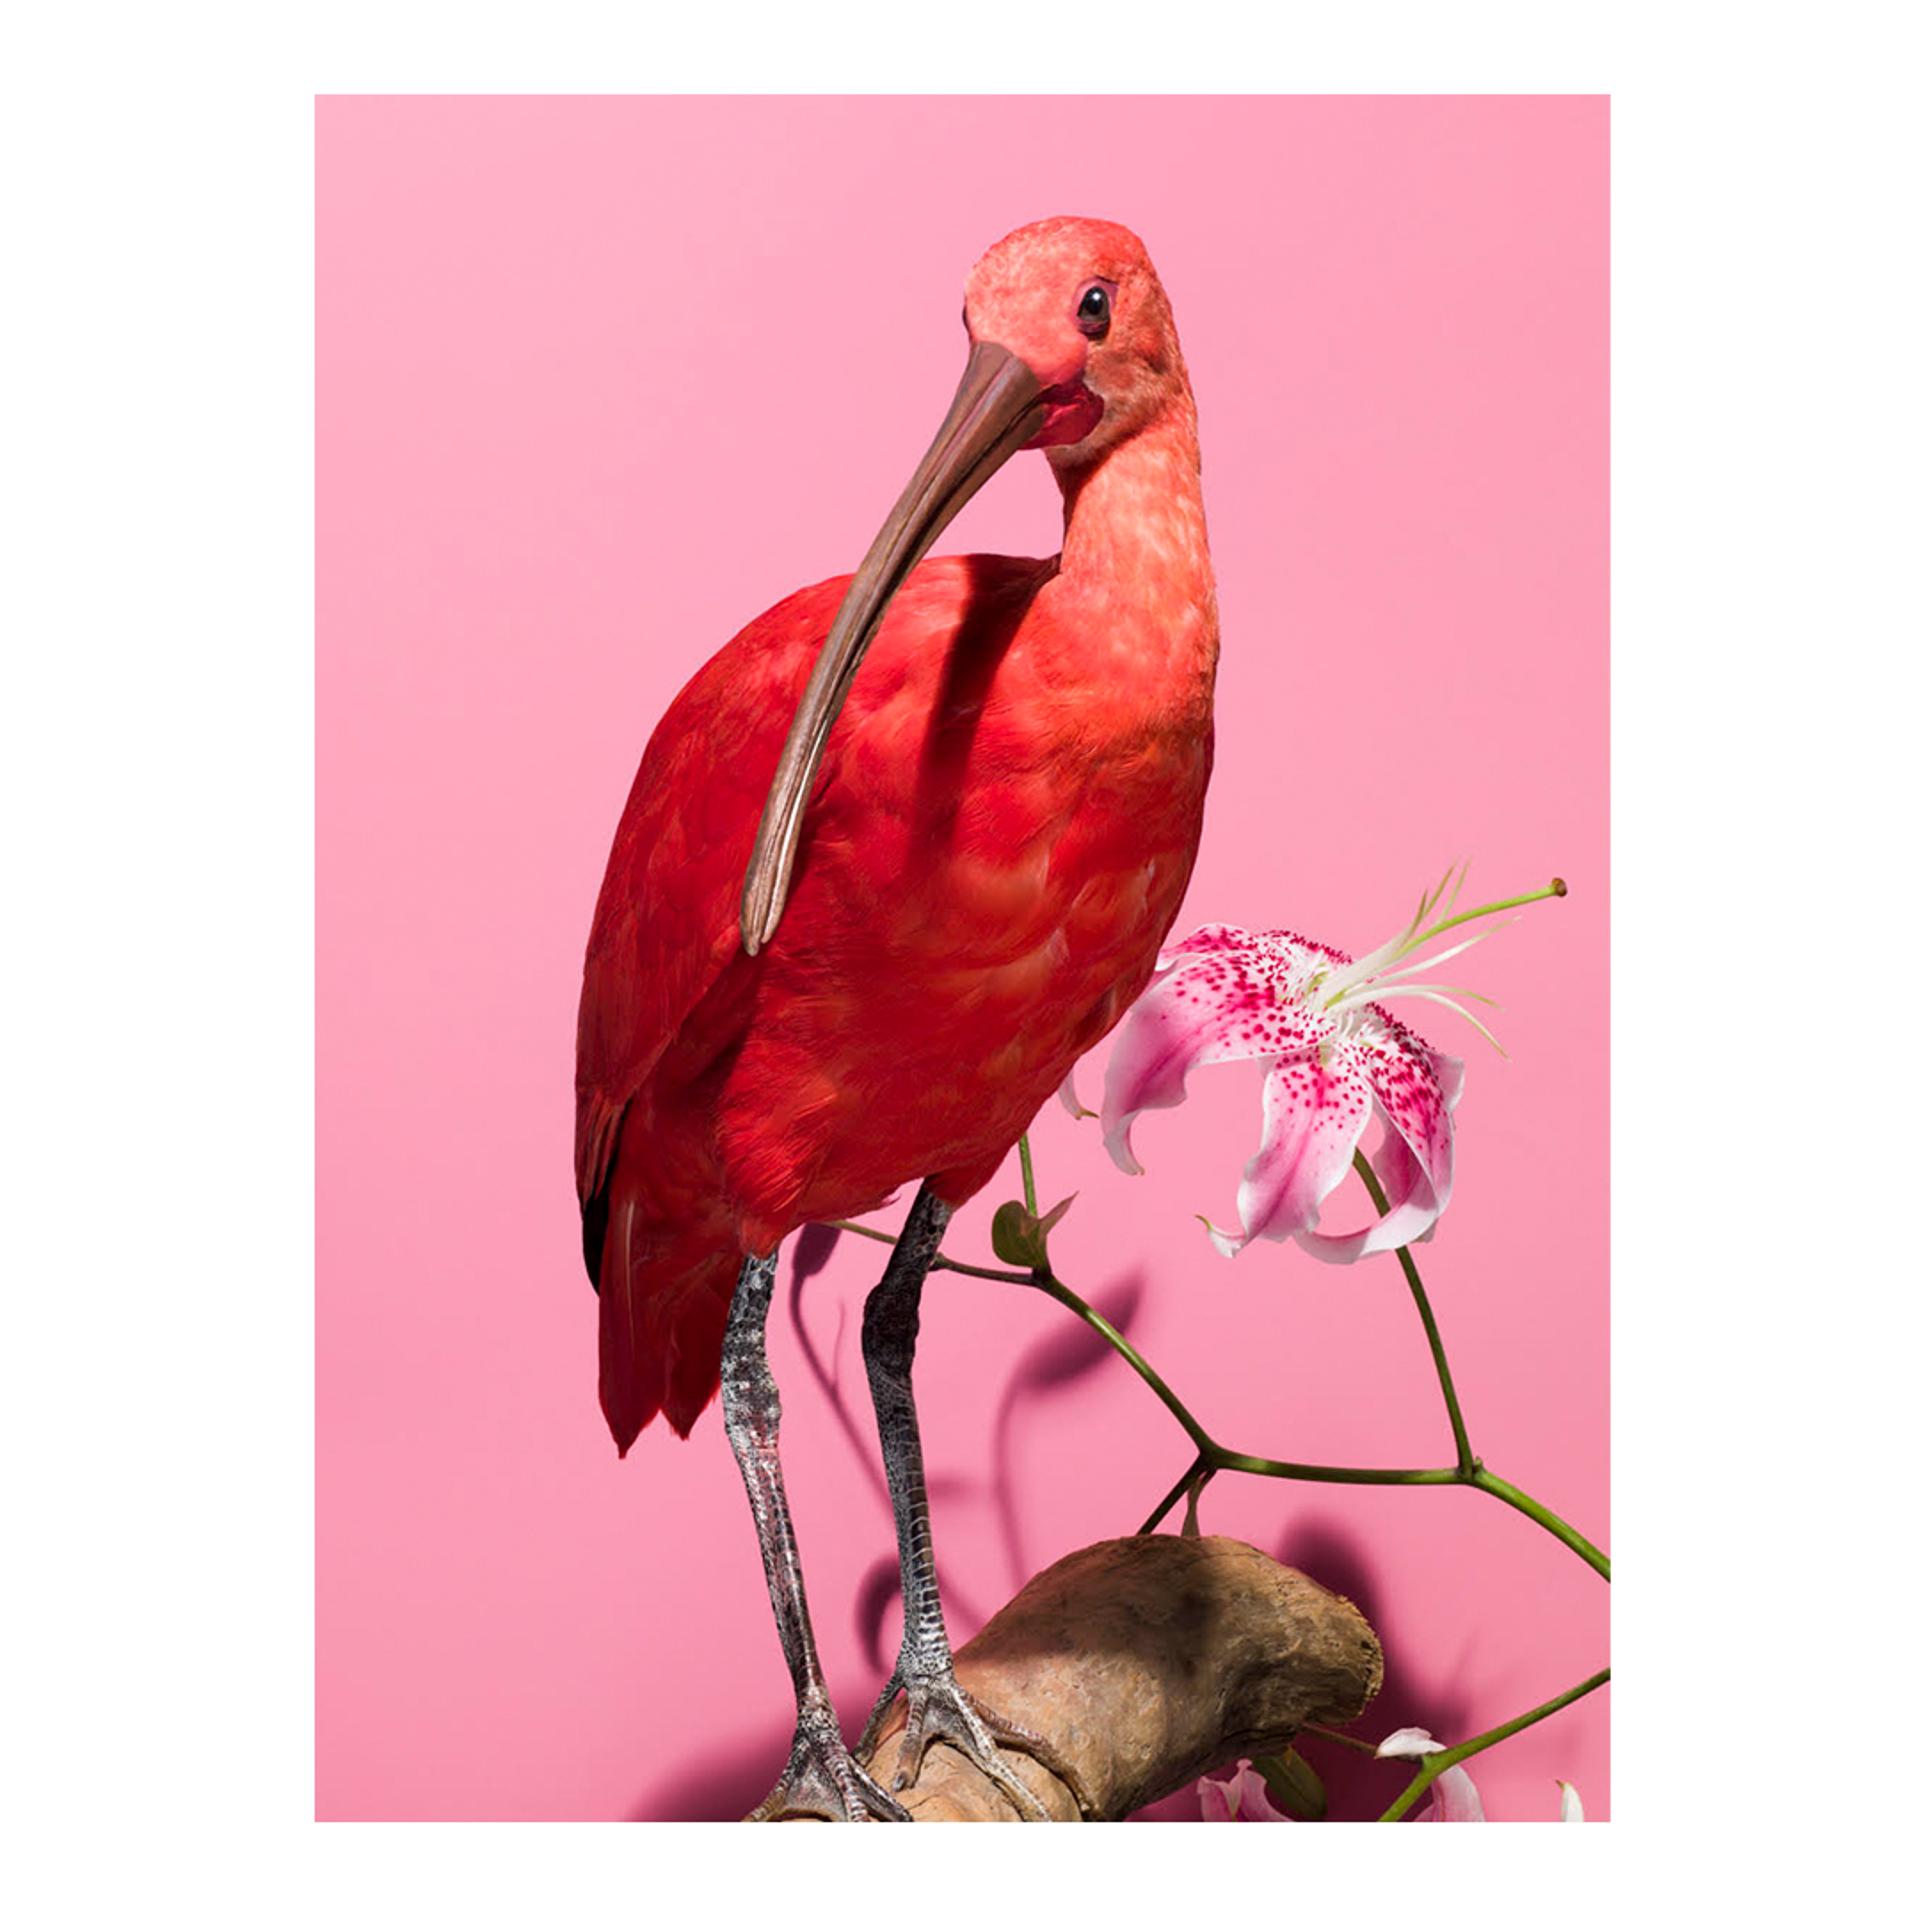 Extinct #2 by Gabriella Imperatori-Penn